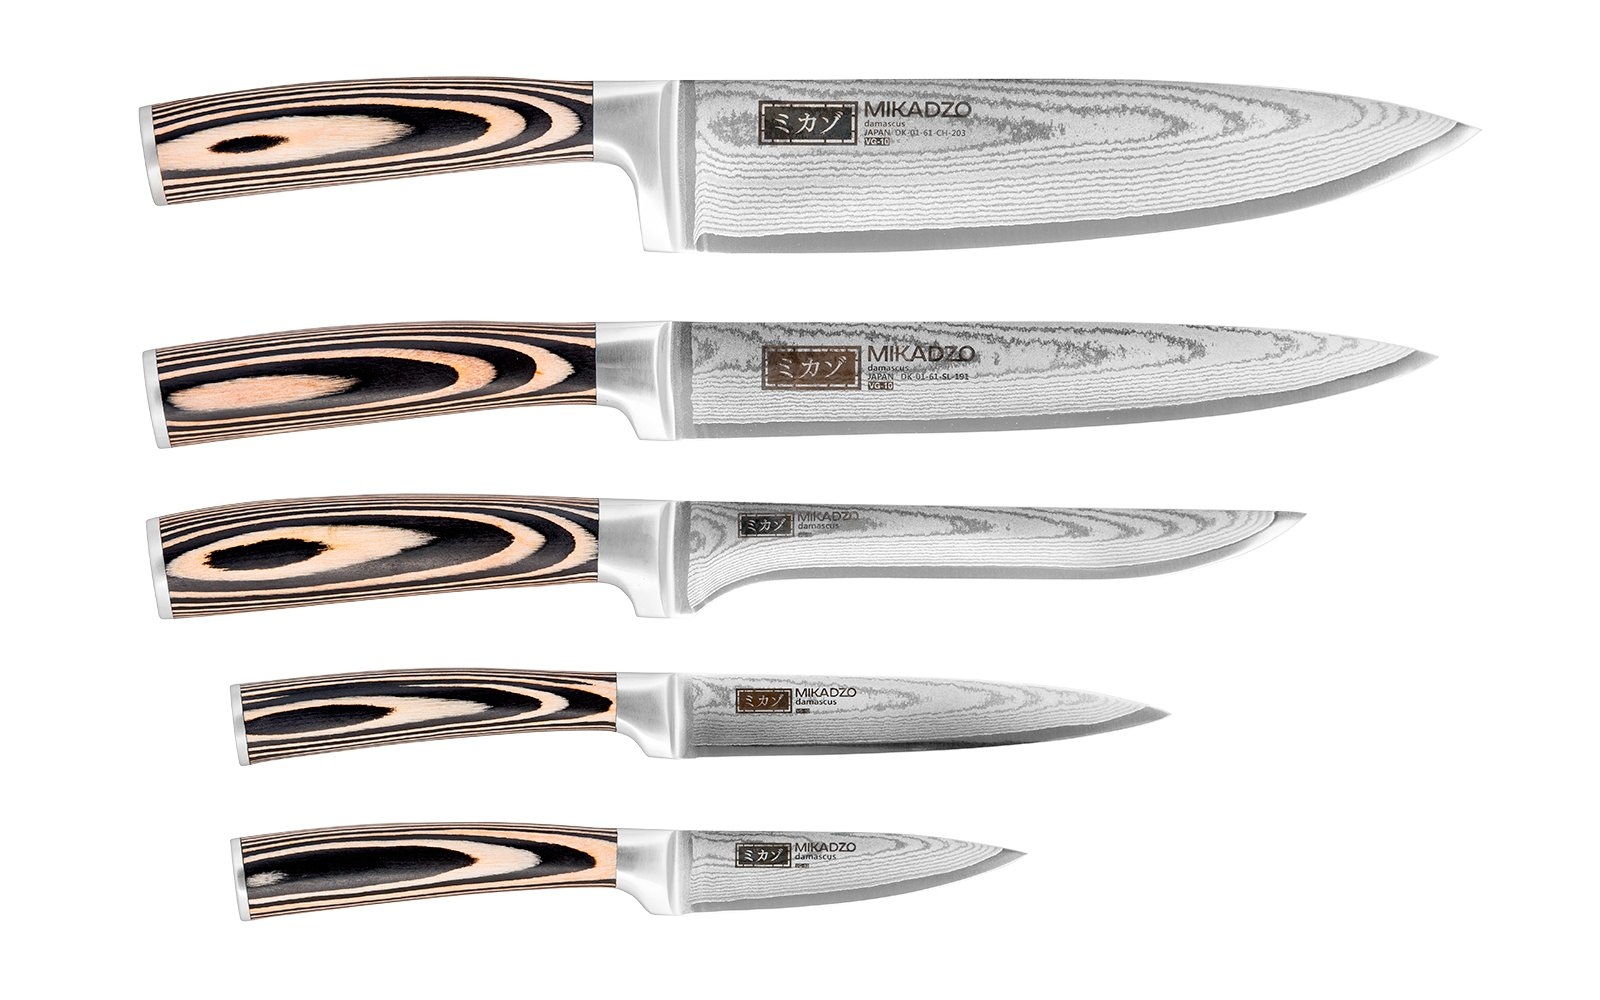 Кухонные ножи Mikadzo DAMASCUS